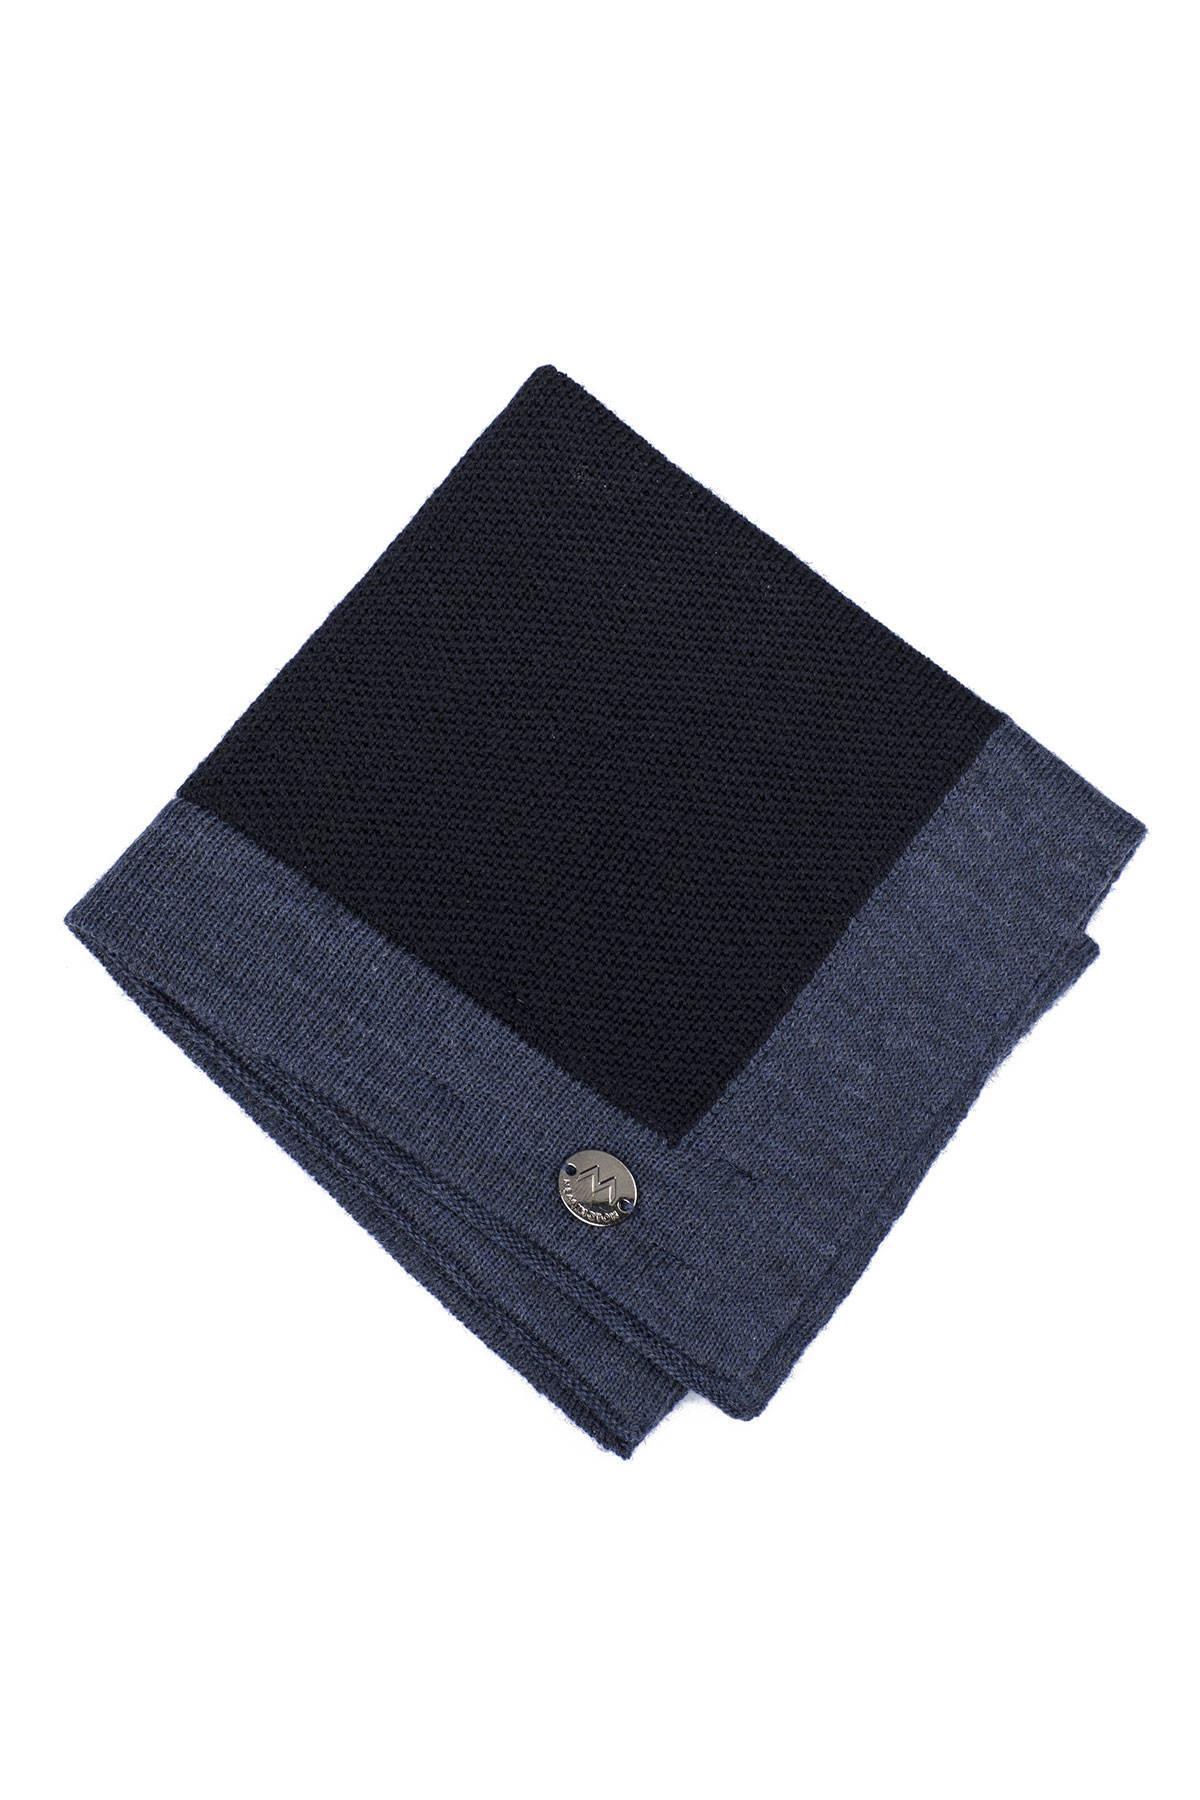 Lacivert Mavi Örgü Ceket Mendili